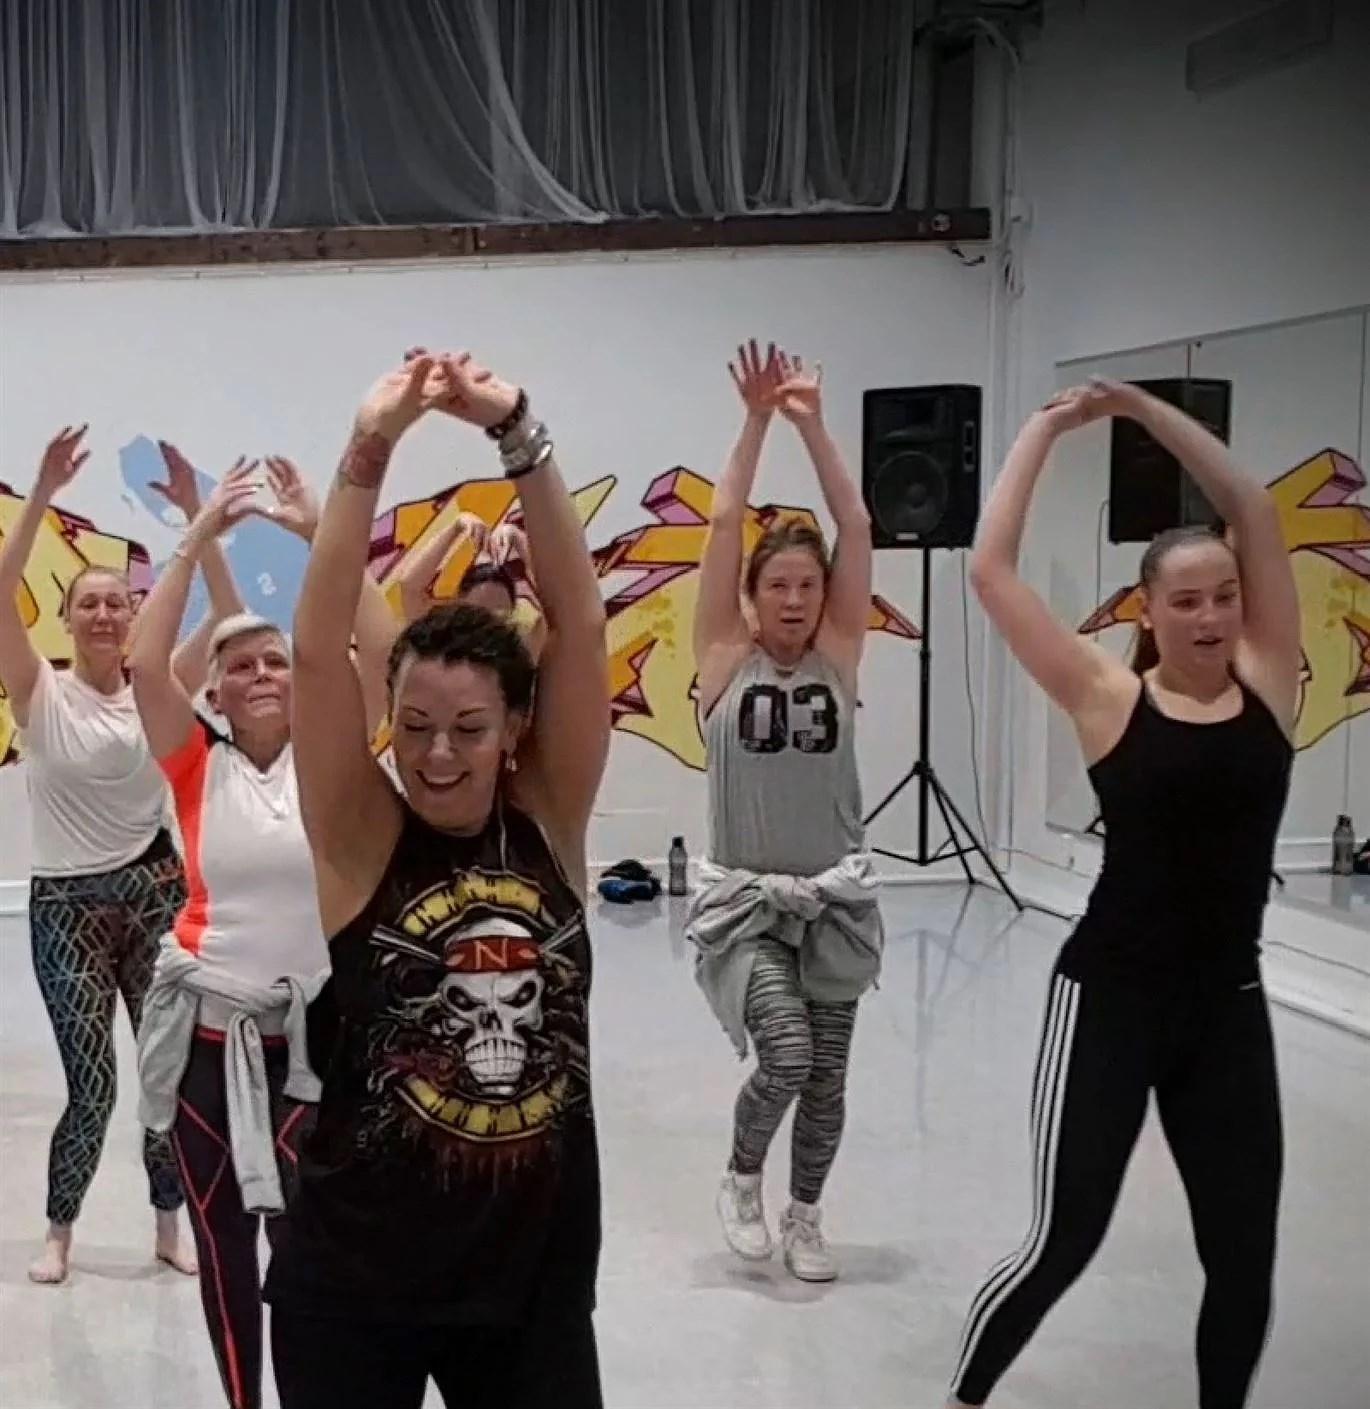 Nya koreografier varje vecka